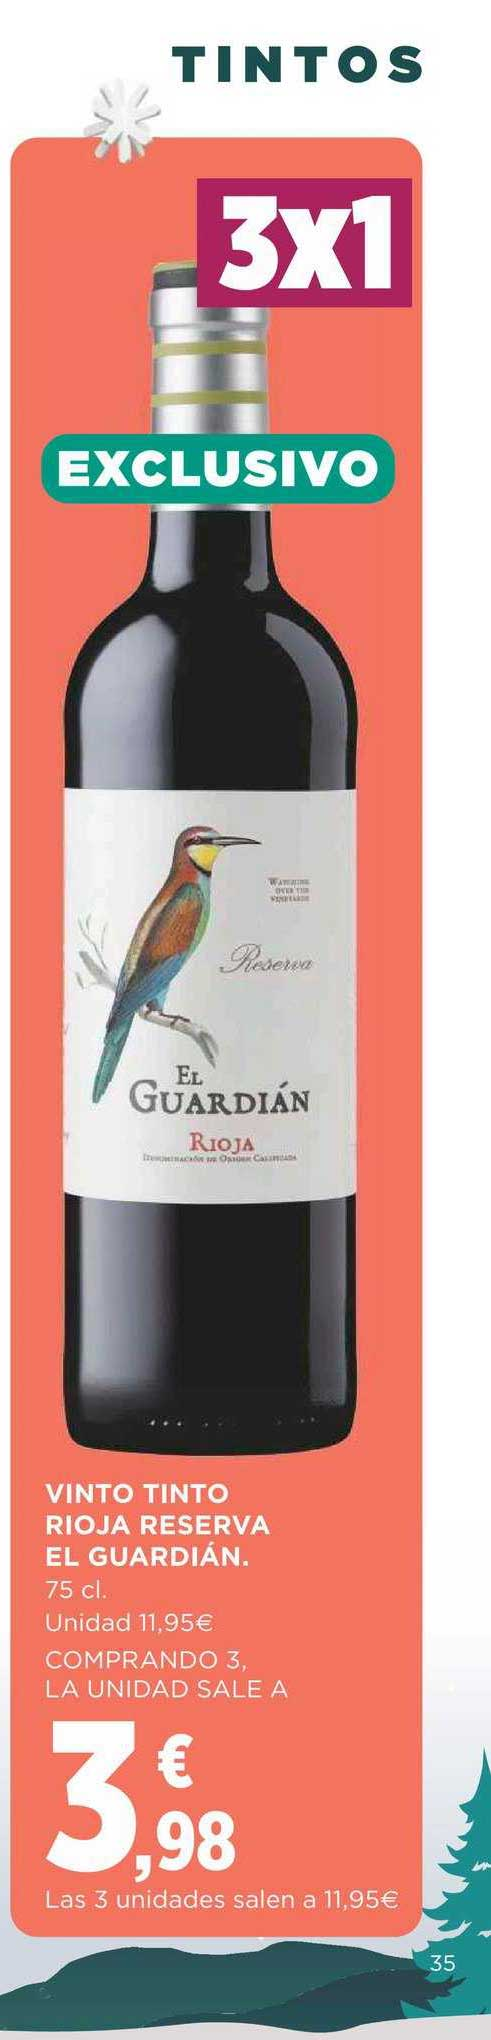 Supercor Vino Tinto Rioja Reserva El Guardián